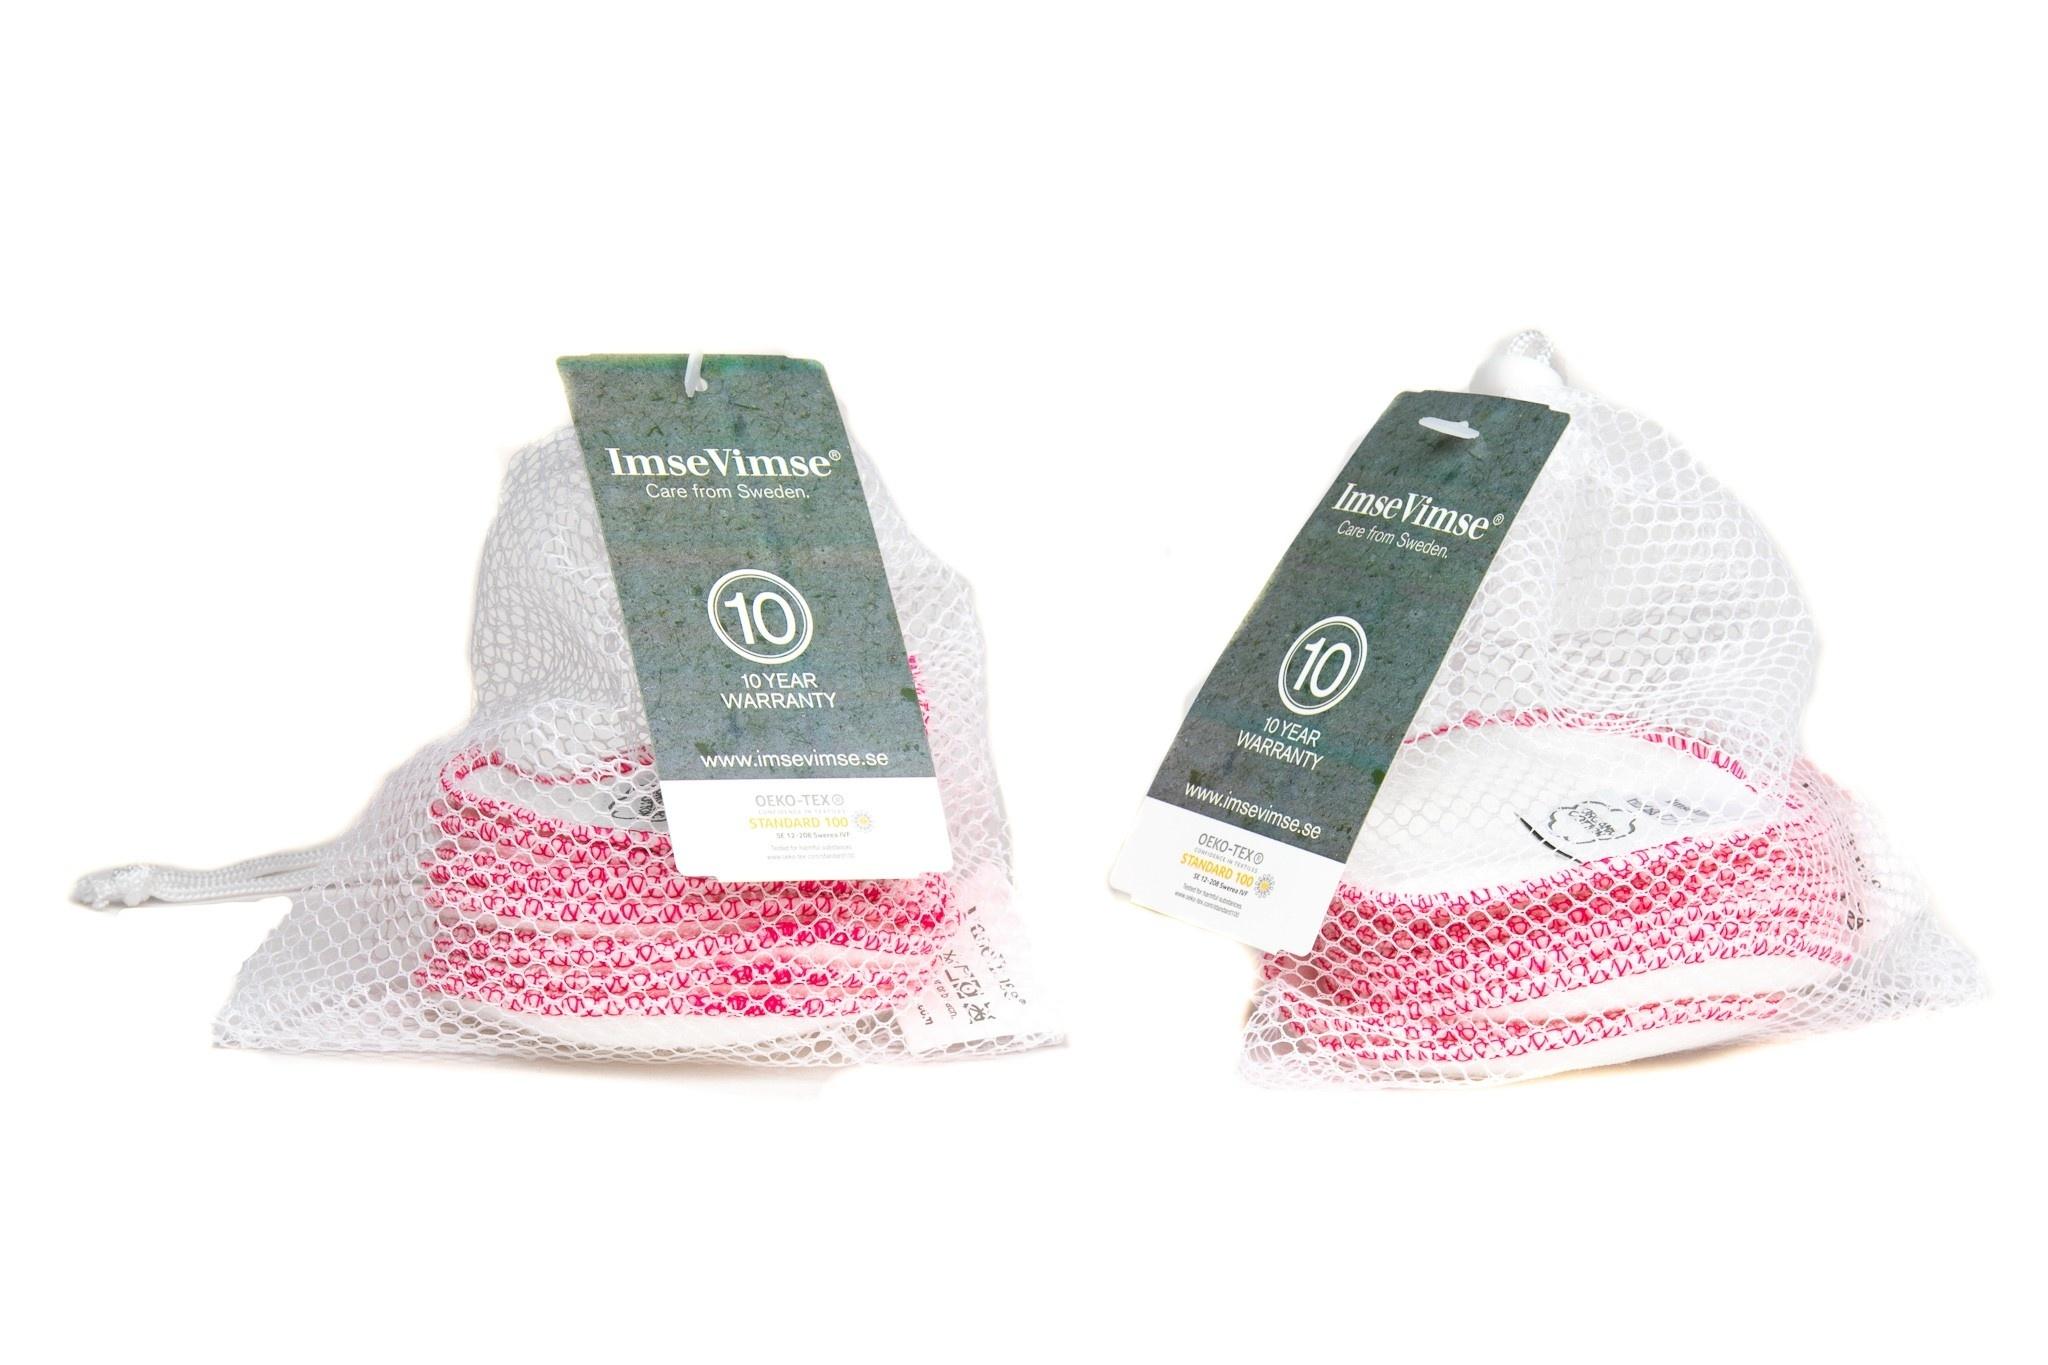 ImseVimse ImseVimse Wasbare Reinigingspads - voordeelverpakking - 2 kleuren